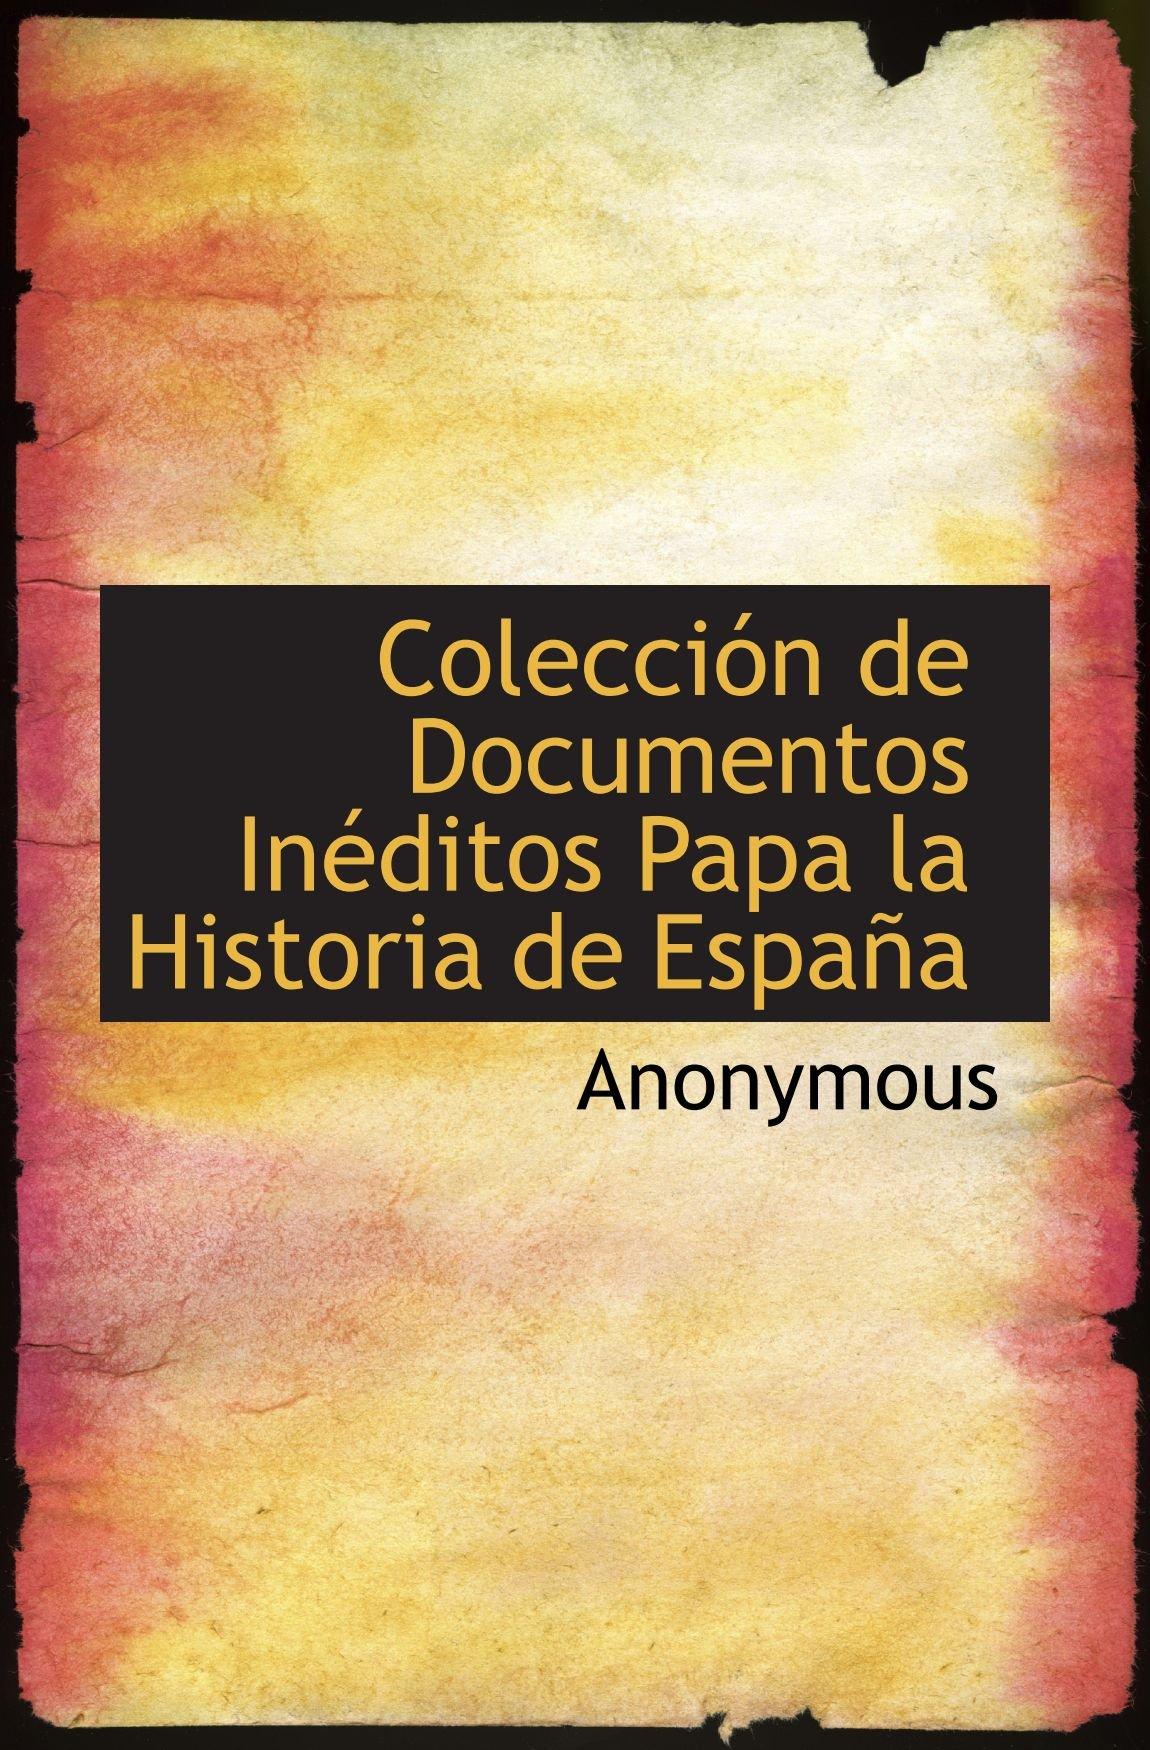 Colección de Documentos Inéditos Papa la Historia de España: Amazon.es: Anonymous, .: Libros